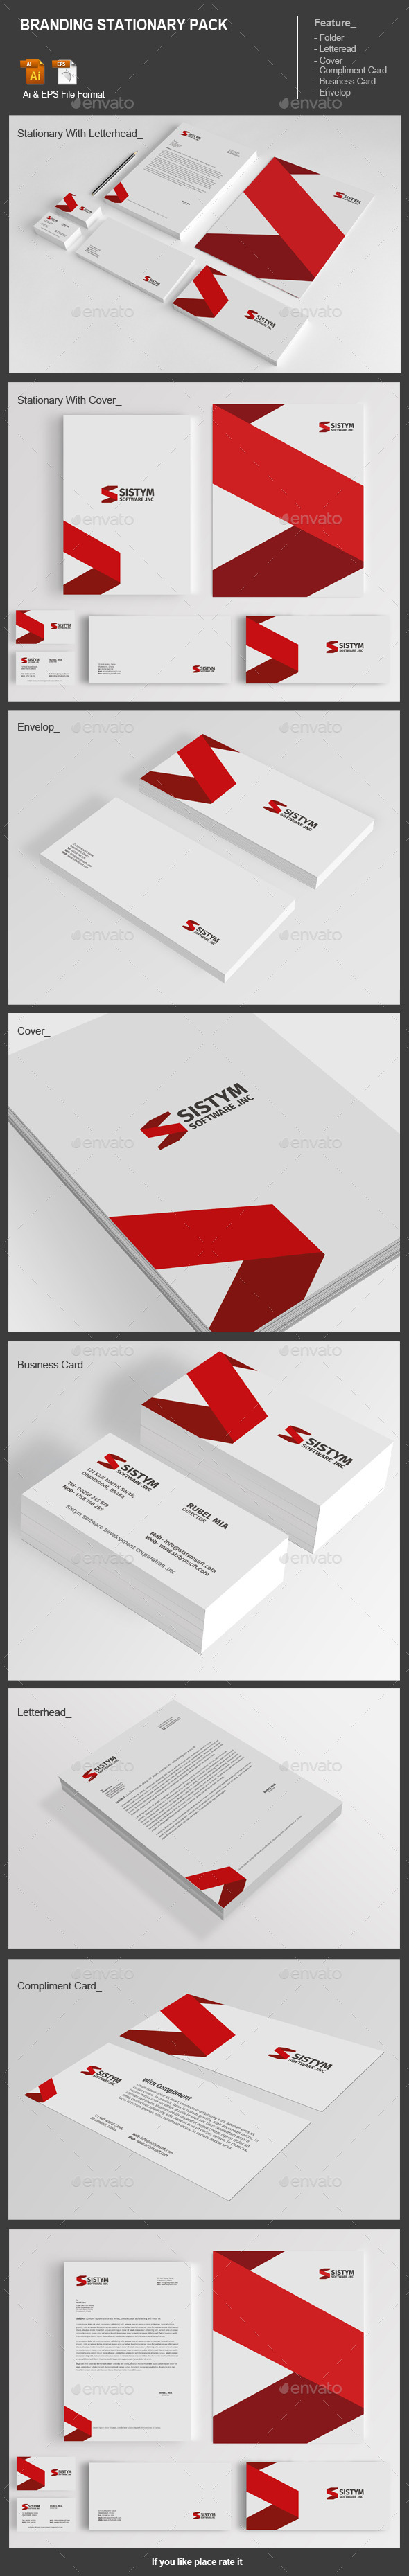 Branding Stationary Pack - Stationery Print Templates